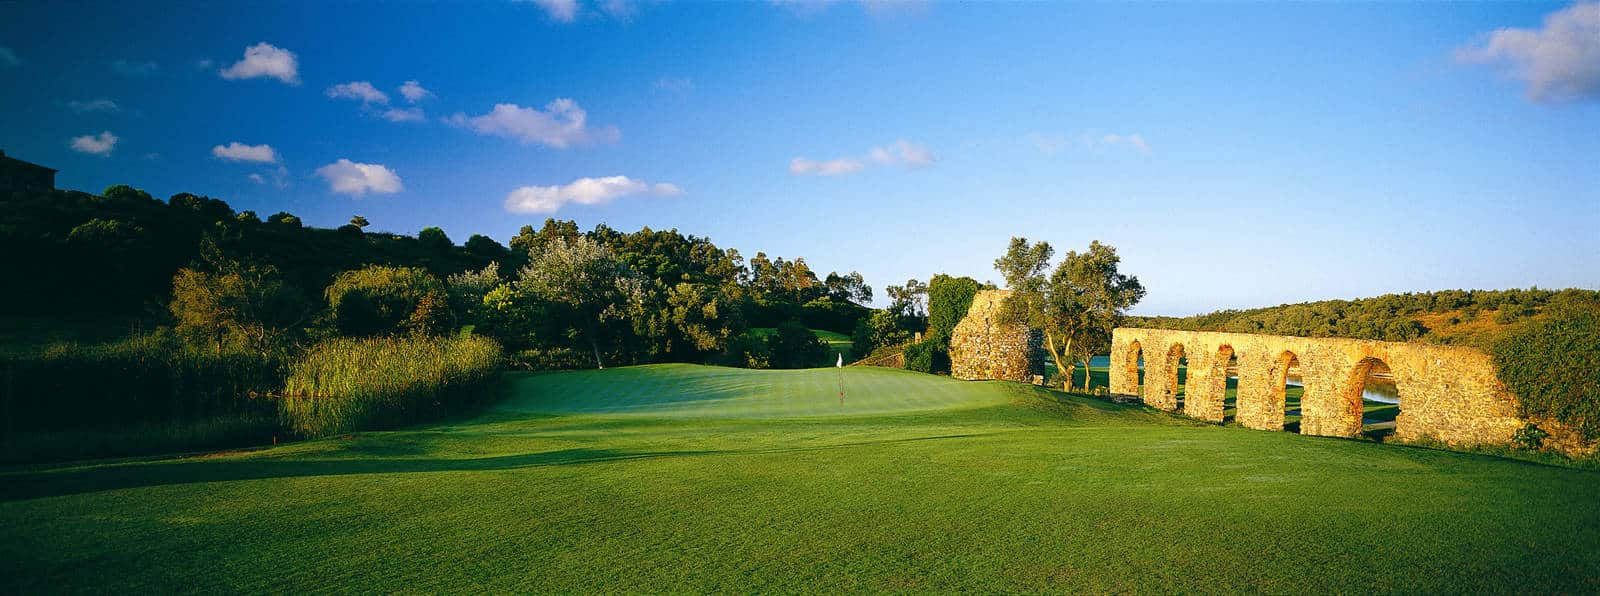 penha-longa-golf-course